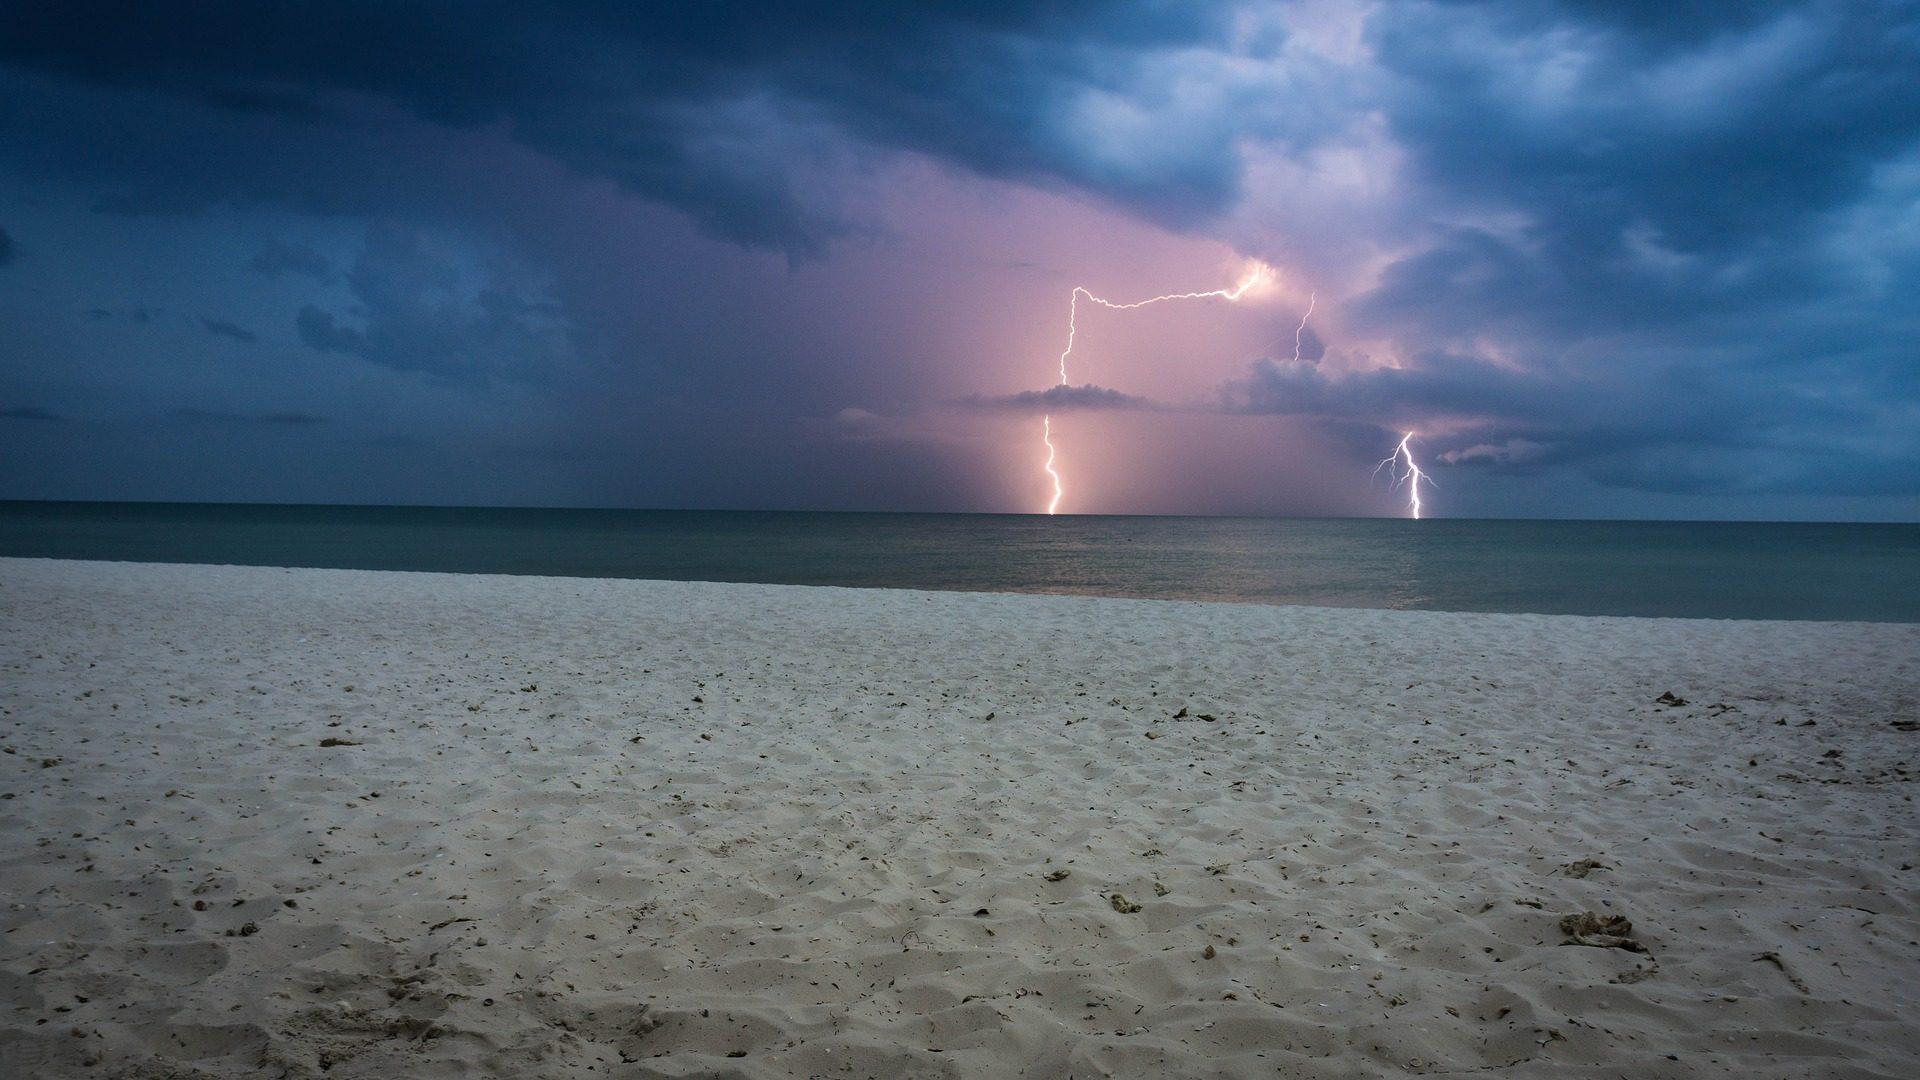 Plage, sable, Storm, nuageux, rayons, Mer - Fonds d'écran HD - Professor-falken.com